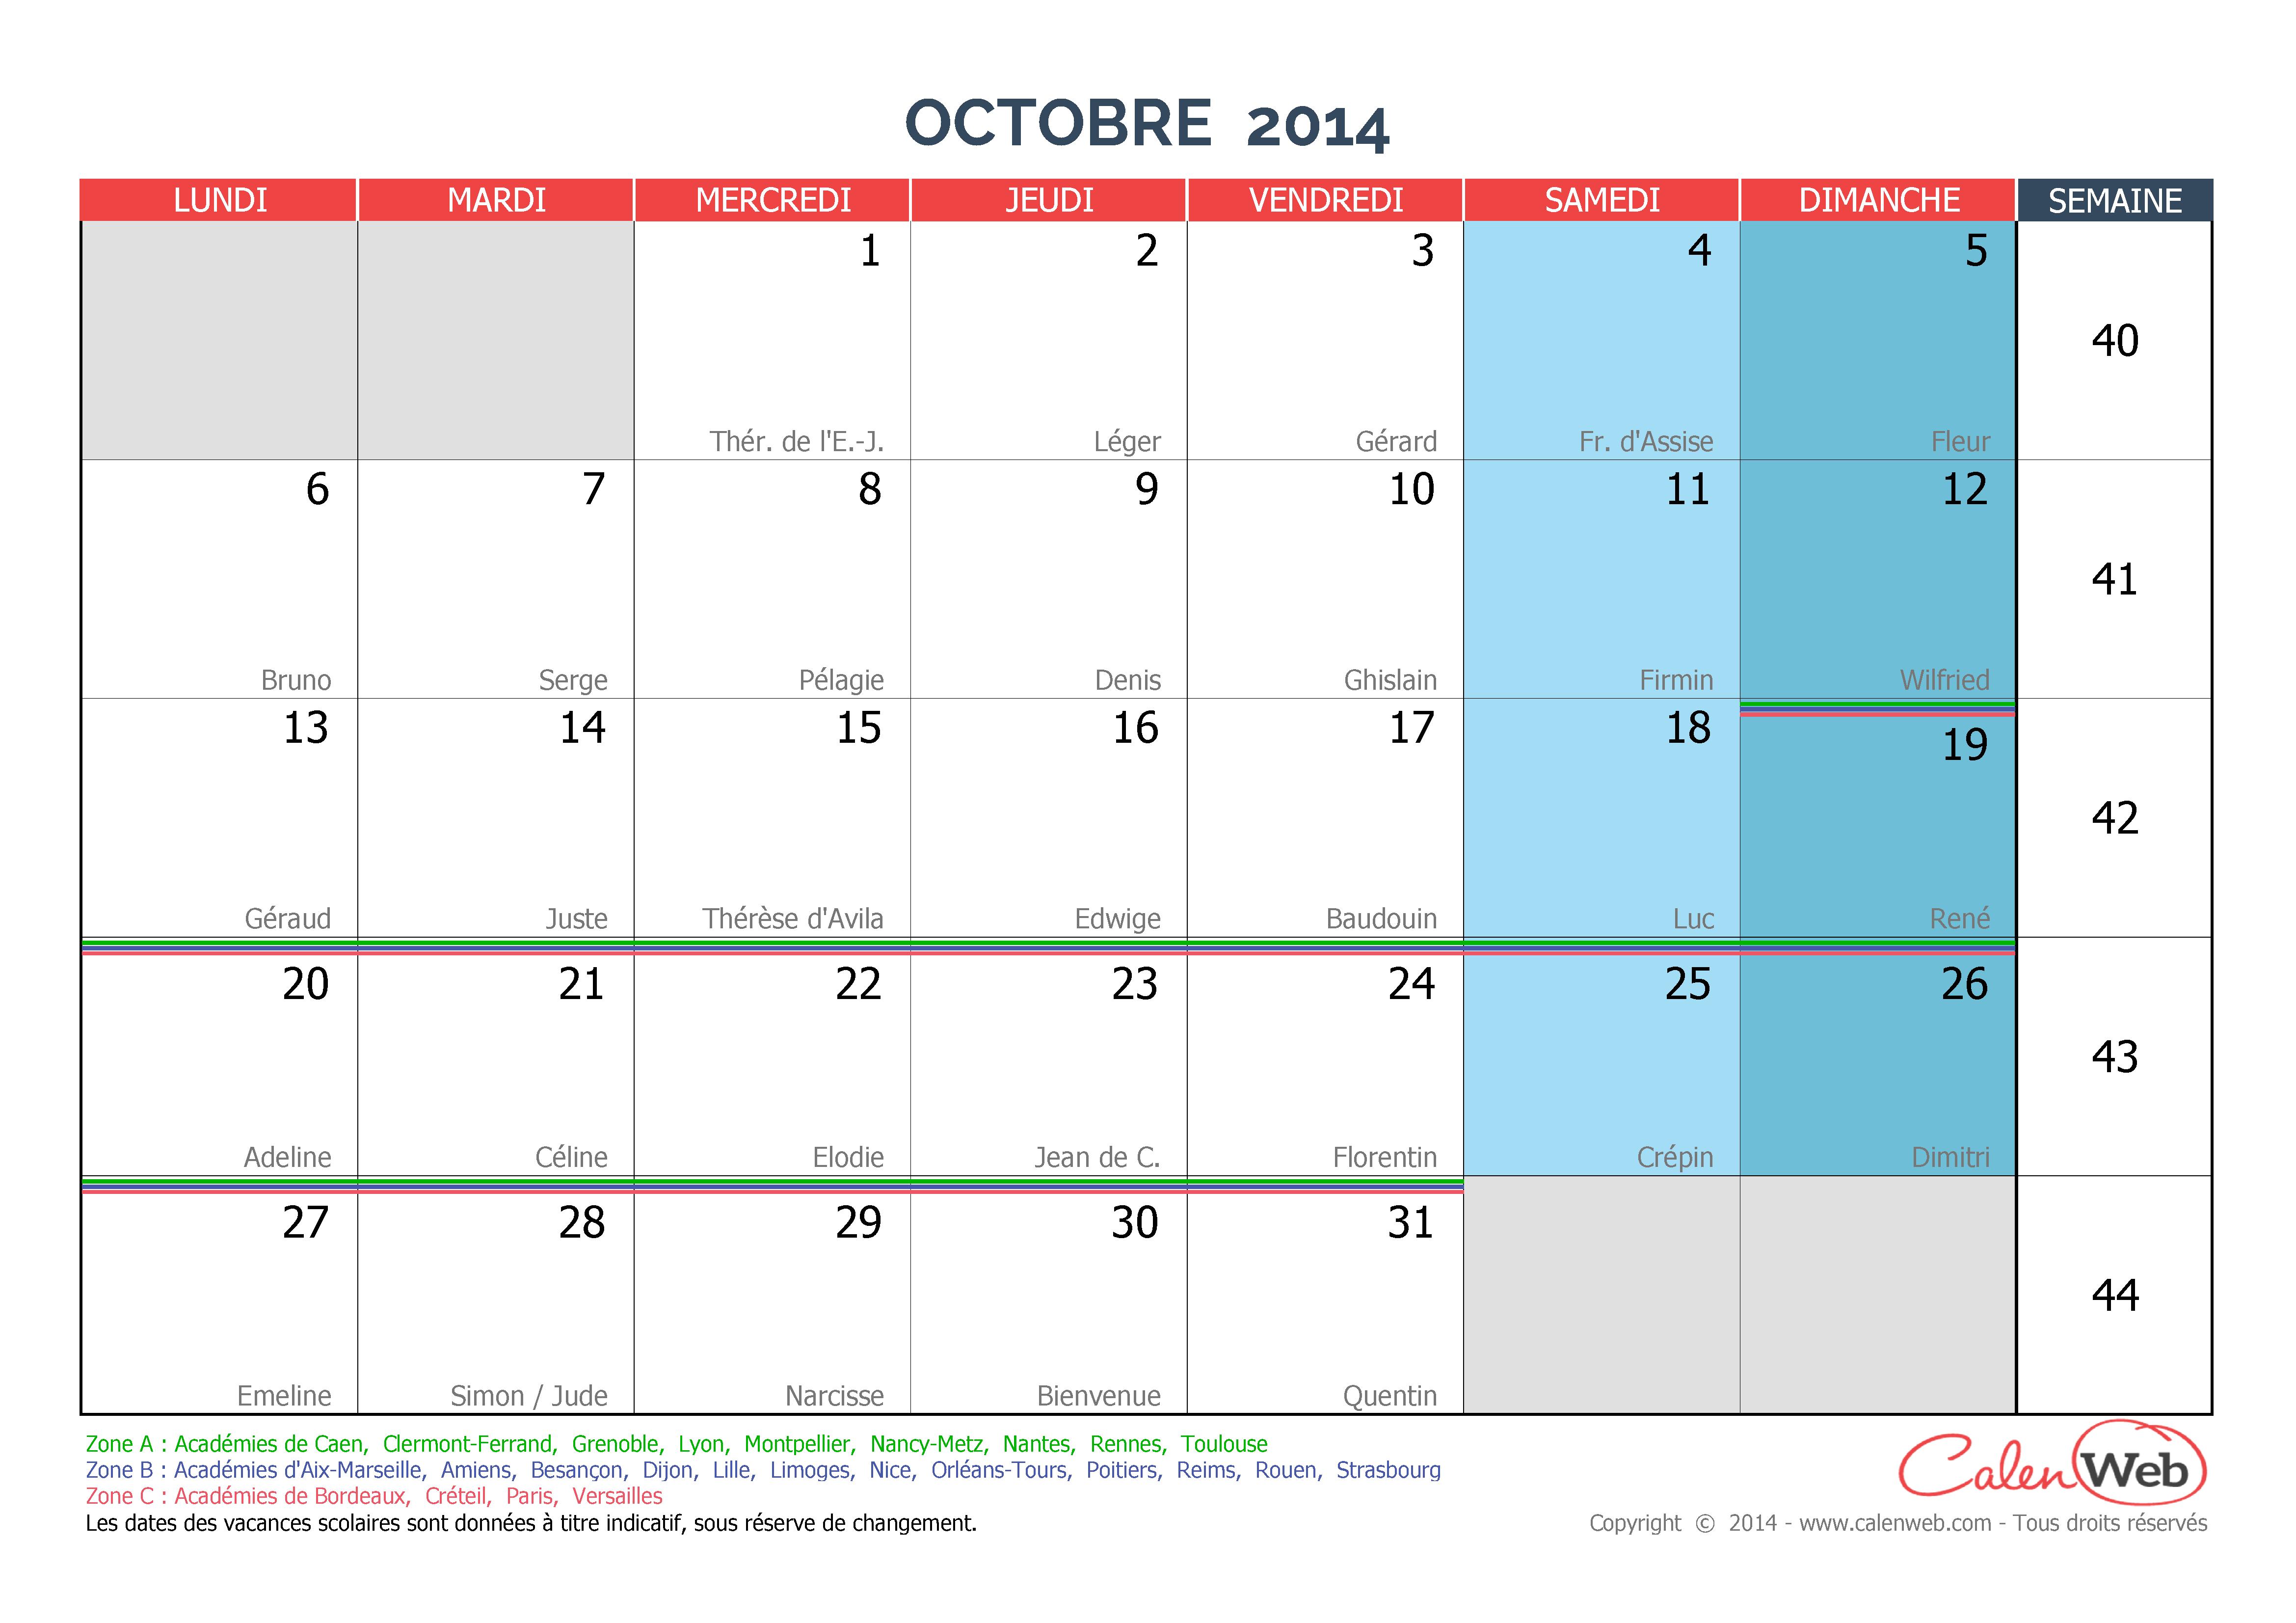 calendrier mensuel mois d 39 octobre 2014 avec f tes jours. Black Bedroom Furniture Sets. Home Design Ideas